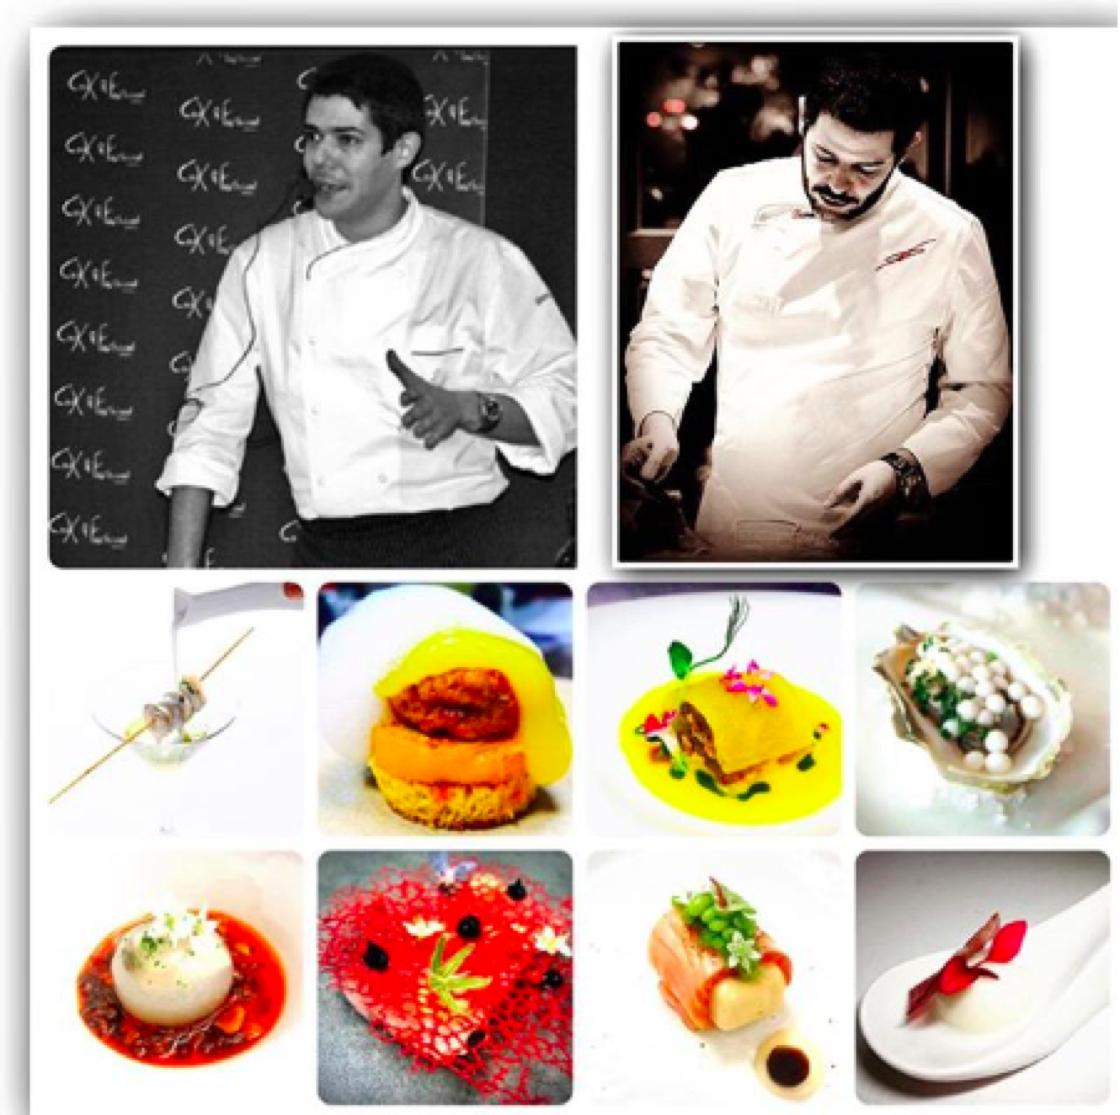 Credit: @chef.daniel.negreira